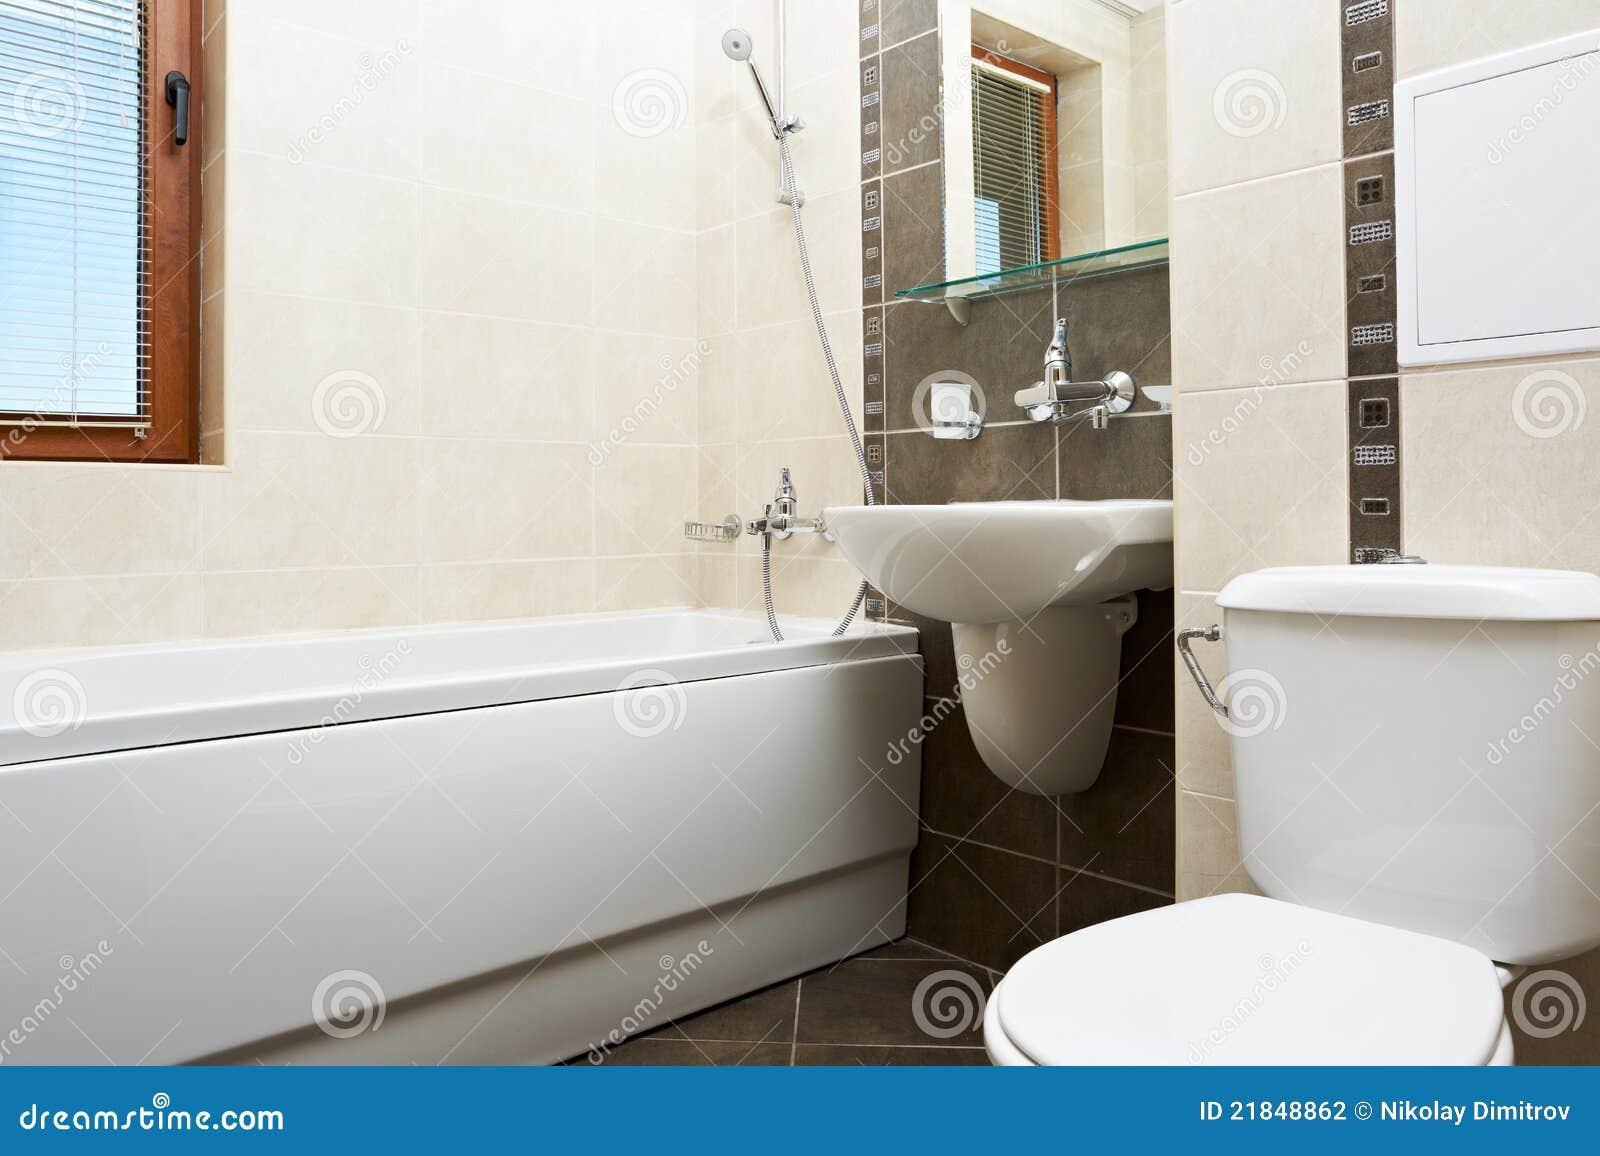 Couleur salle de bain moderne - Couleur salle de bain moderne ...